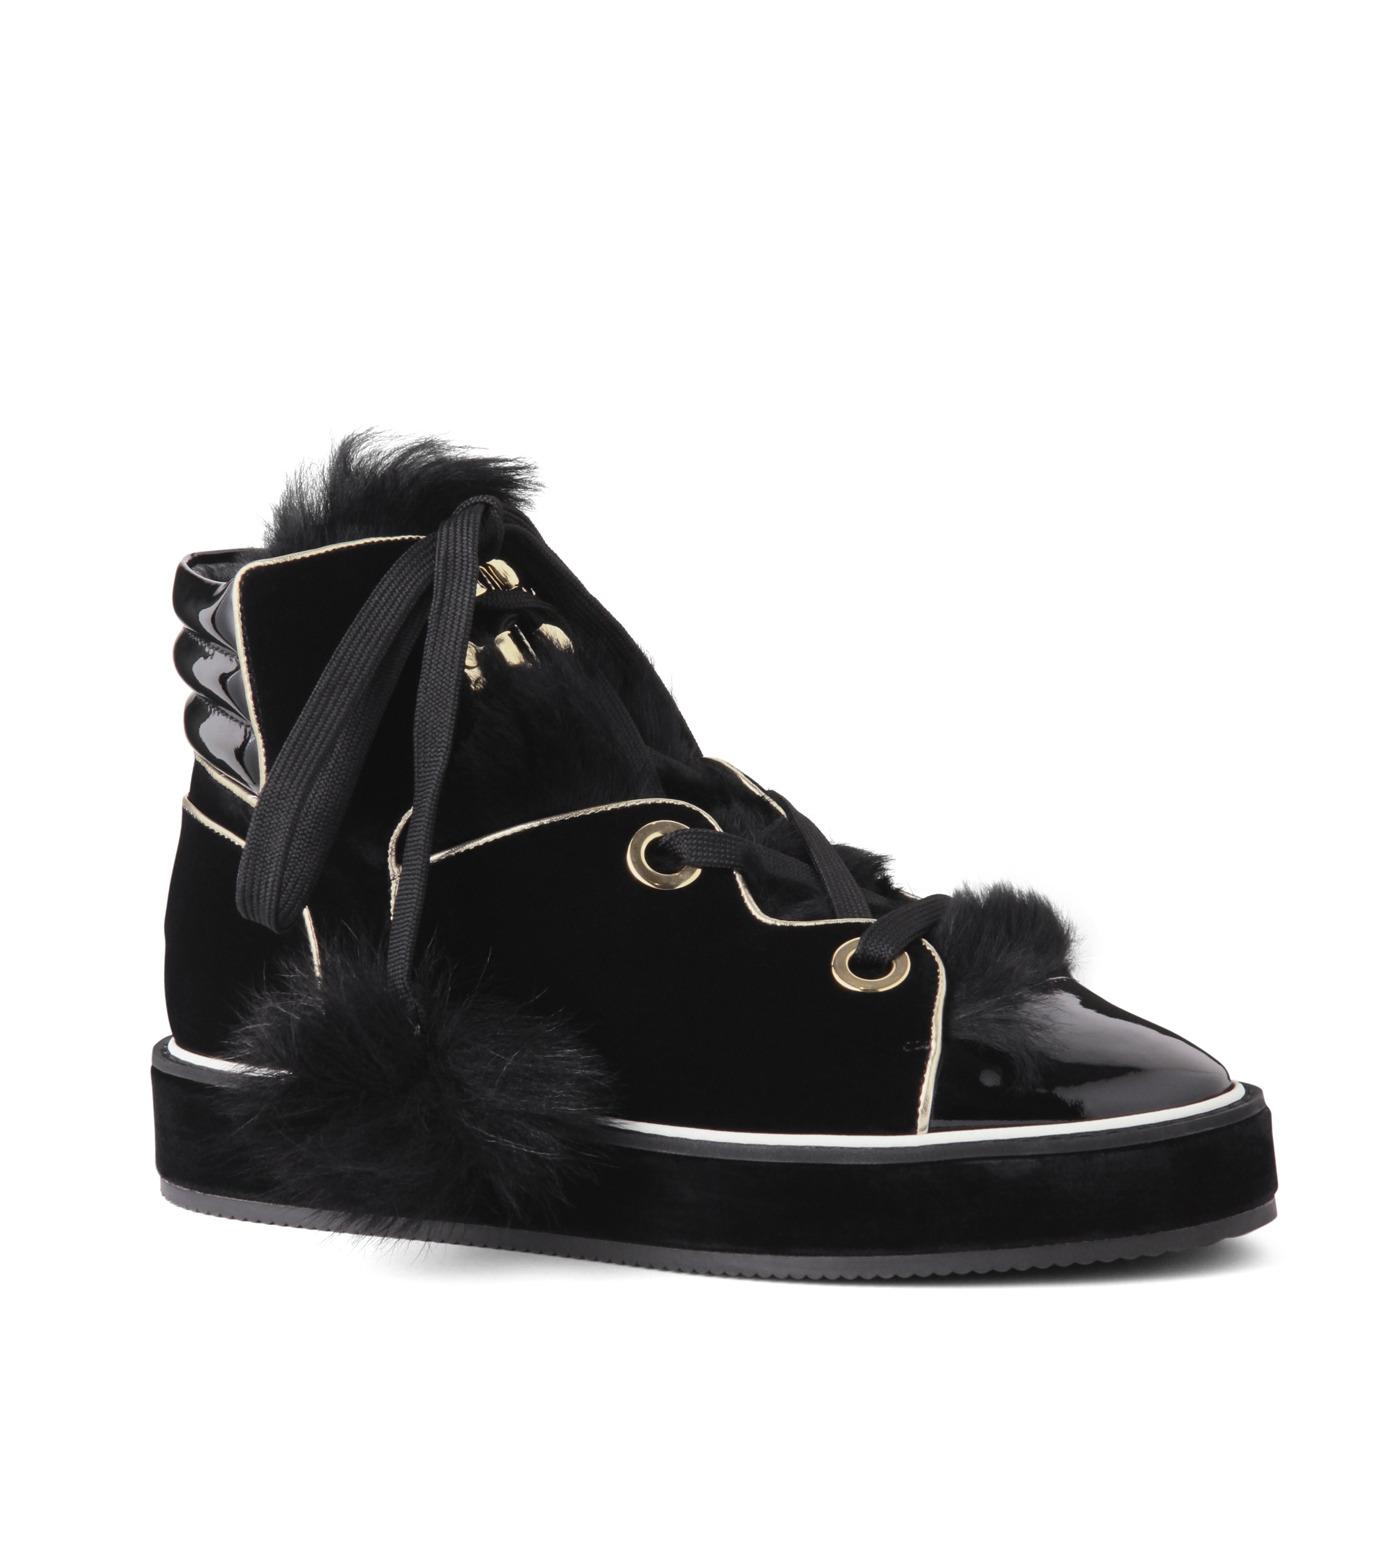 Nicholas  Kirkwood(ニコラス カークウッド)のPolly Neige High Top-BLACK(スニーカー/sneaker)-15AL161-13 拡大詳細画像1